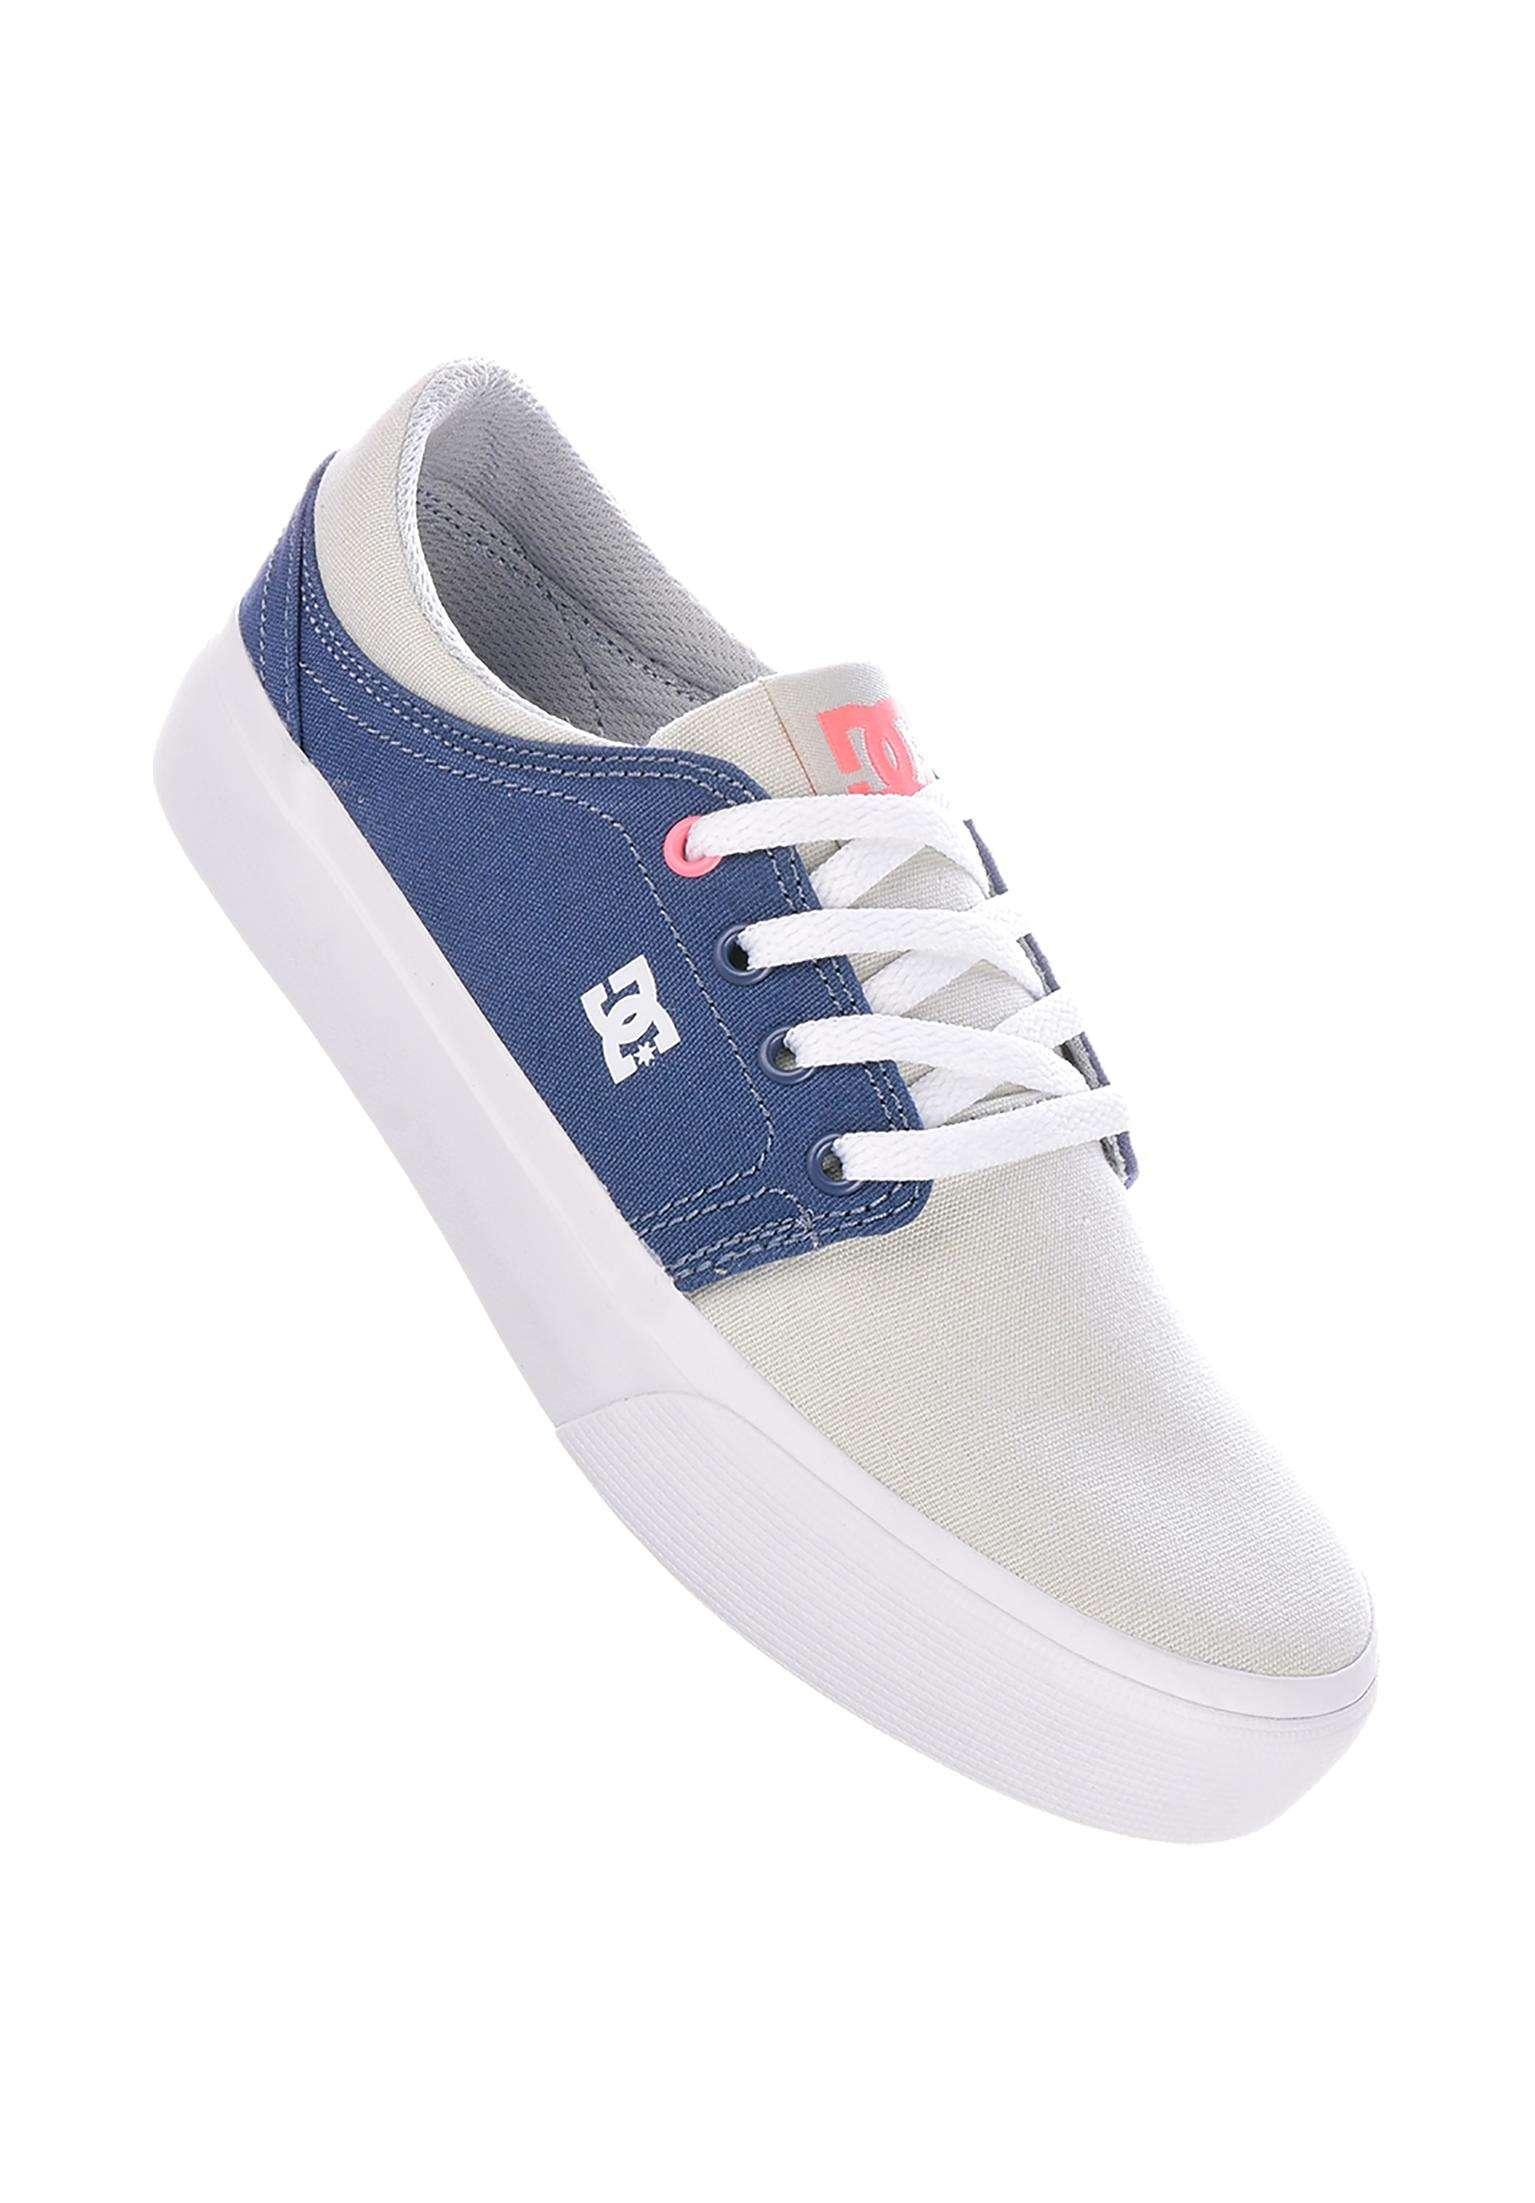 b6a6a8980752a9 Trase TX DC Shoes Alle Schuhe in blue-grey für Damen